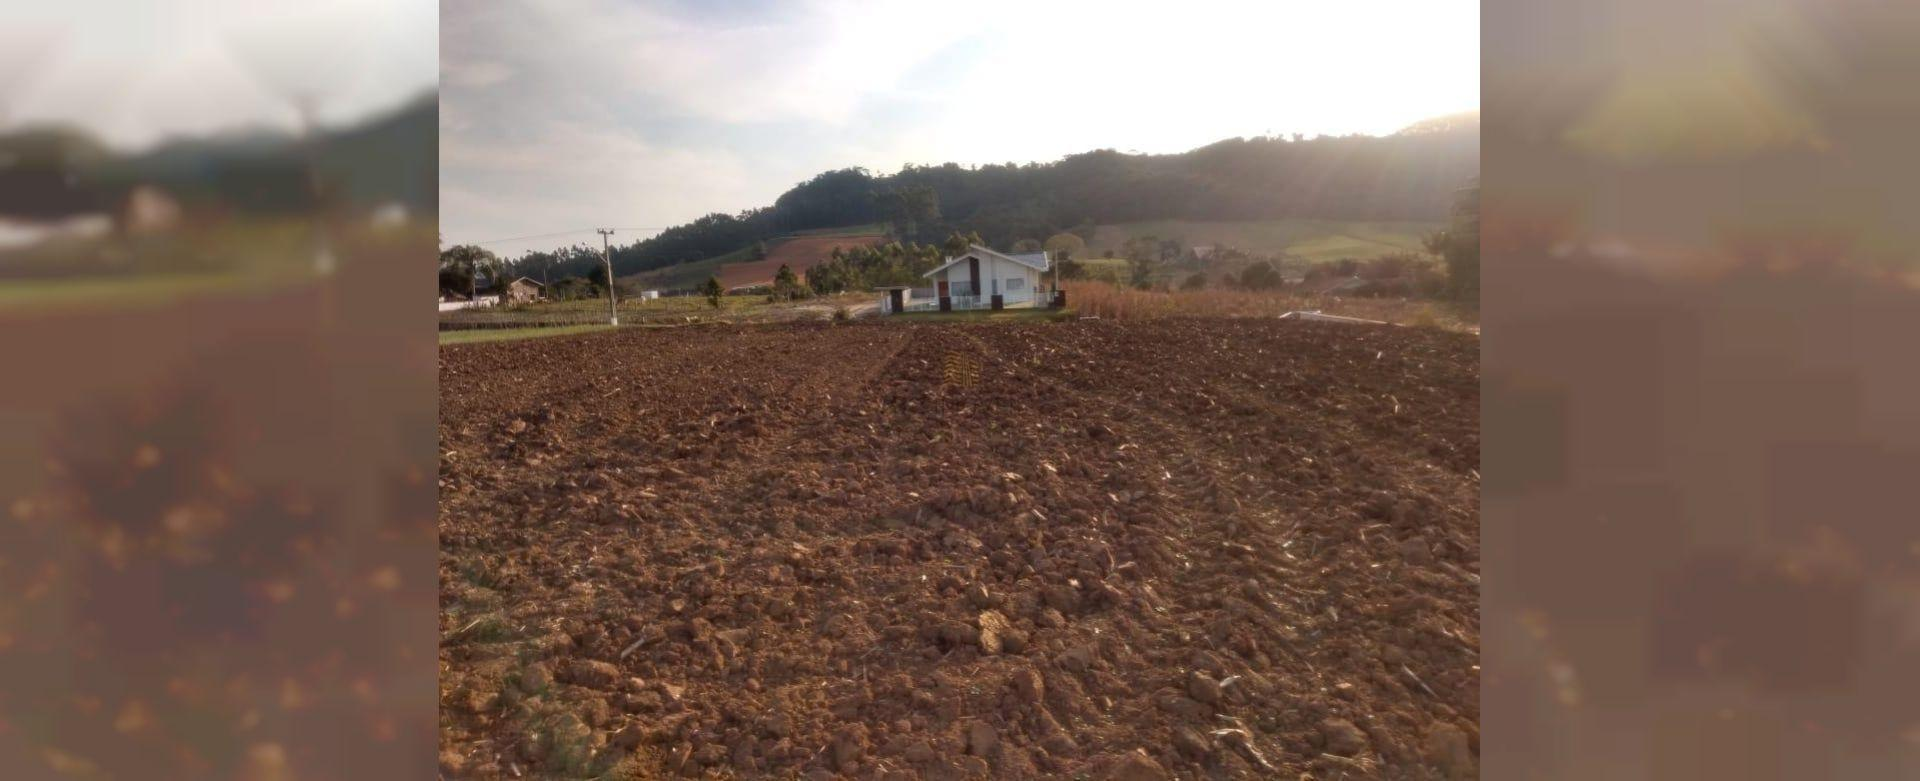 Terreno - Cerro Negro, Ituporanga/SC. - Ituporanga/SC, Cerro Negro